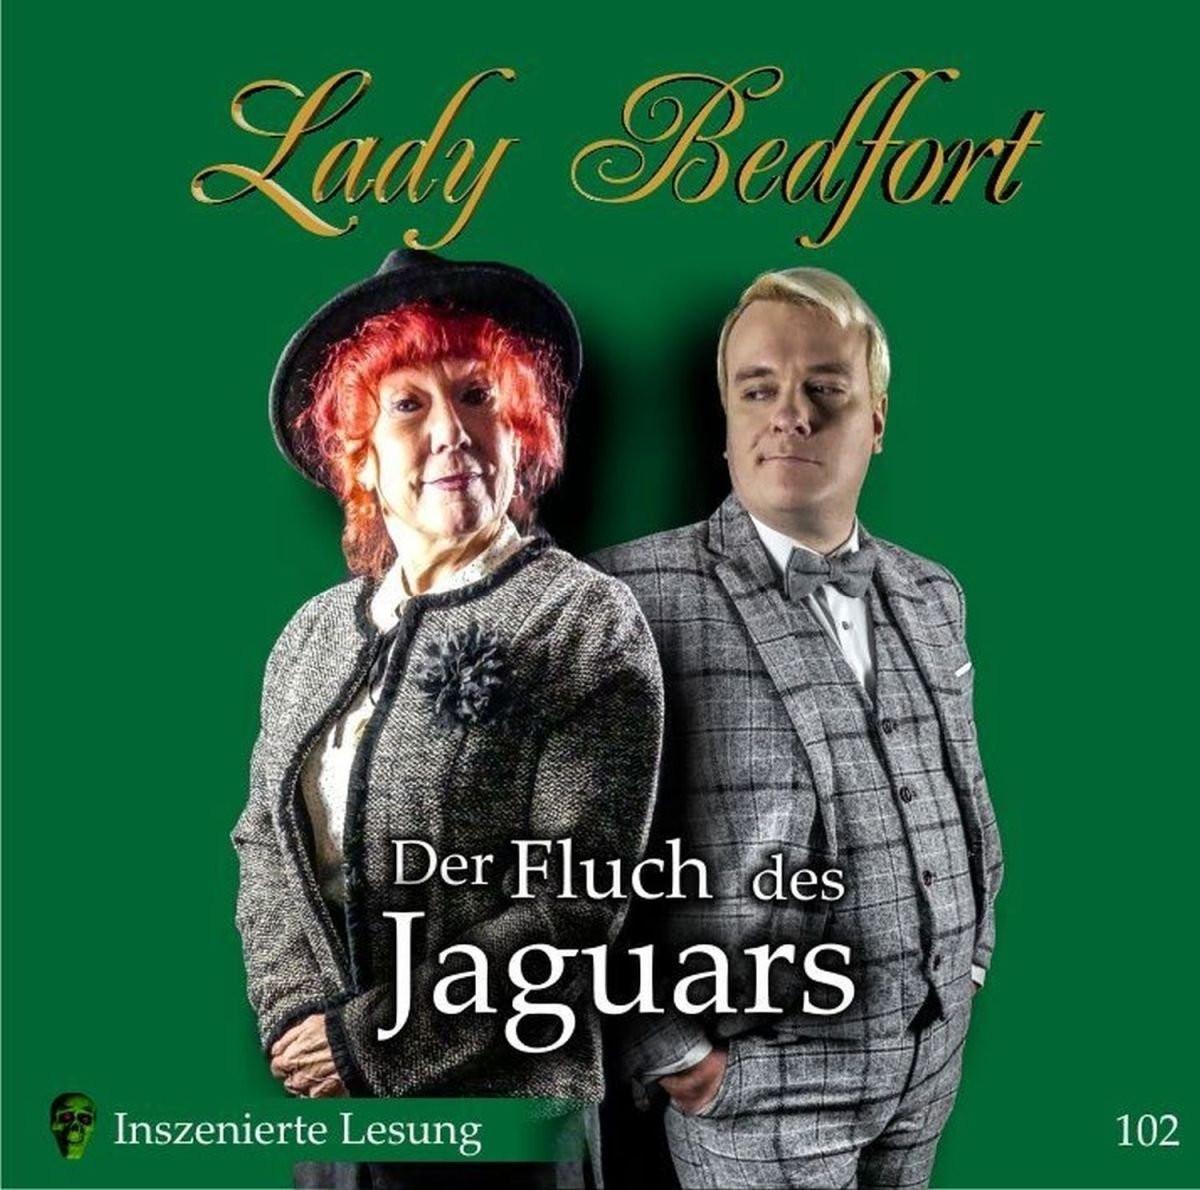 Lady Bedfort - Folge 102: Der Fluch des Jaguars (Inszenierte Lesung)